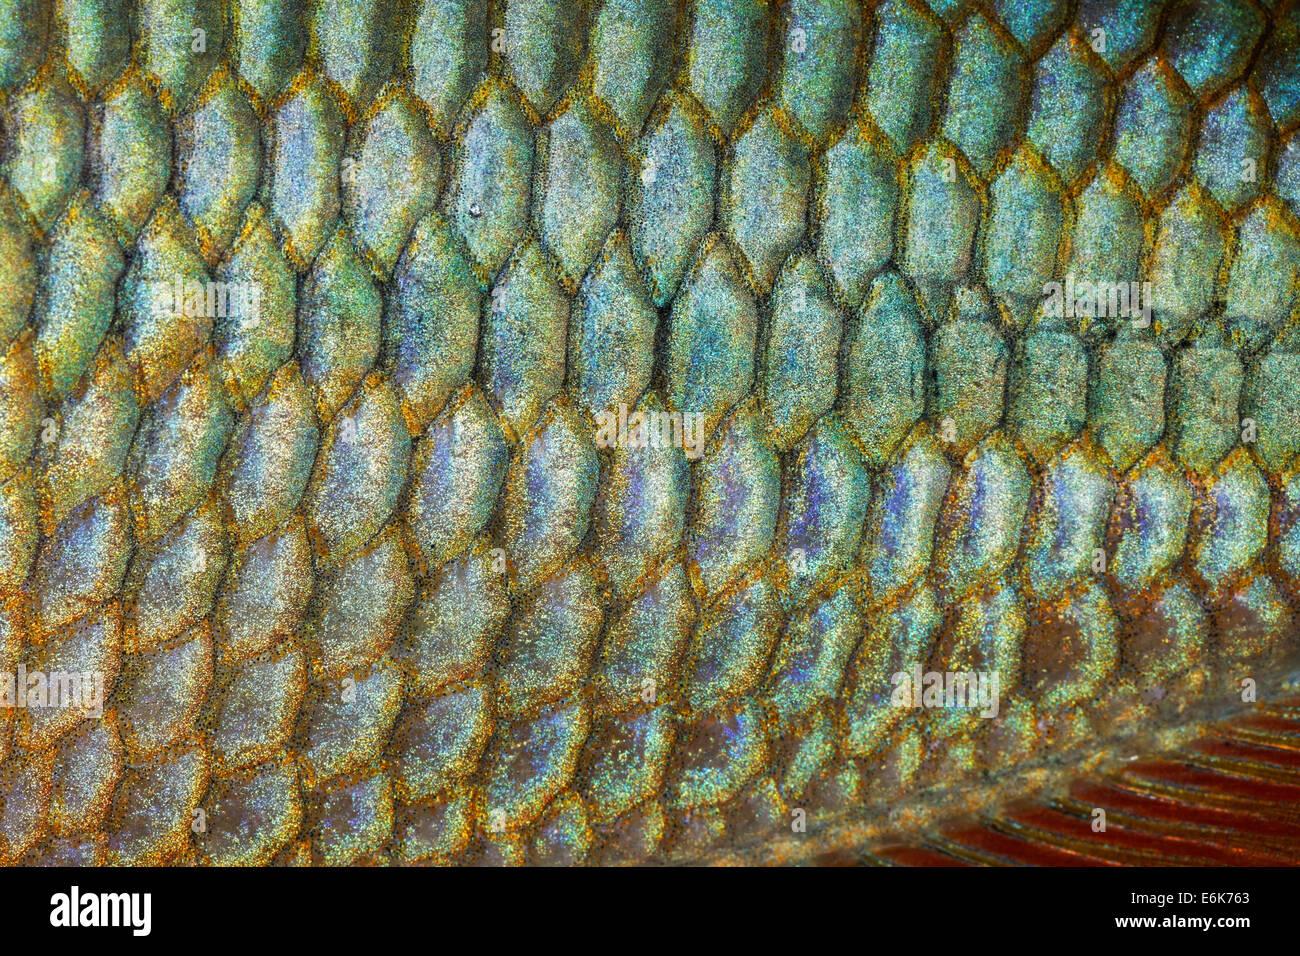 Scales of a Jewel Rainbow Fish or Banded Rainbowfish (Melanotaenia trifasciata), native to Australia, freshwater - Stock Image